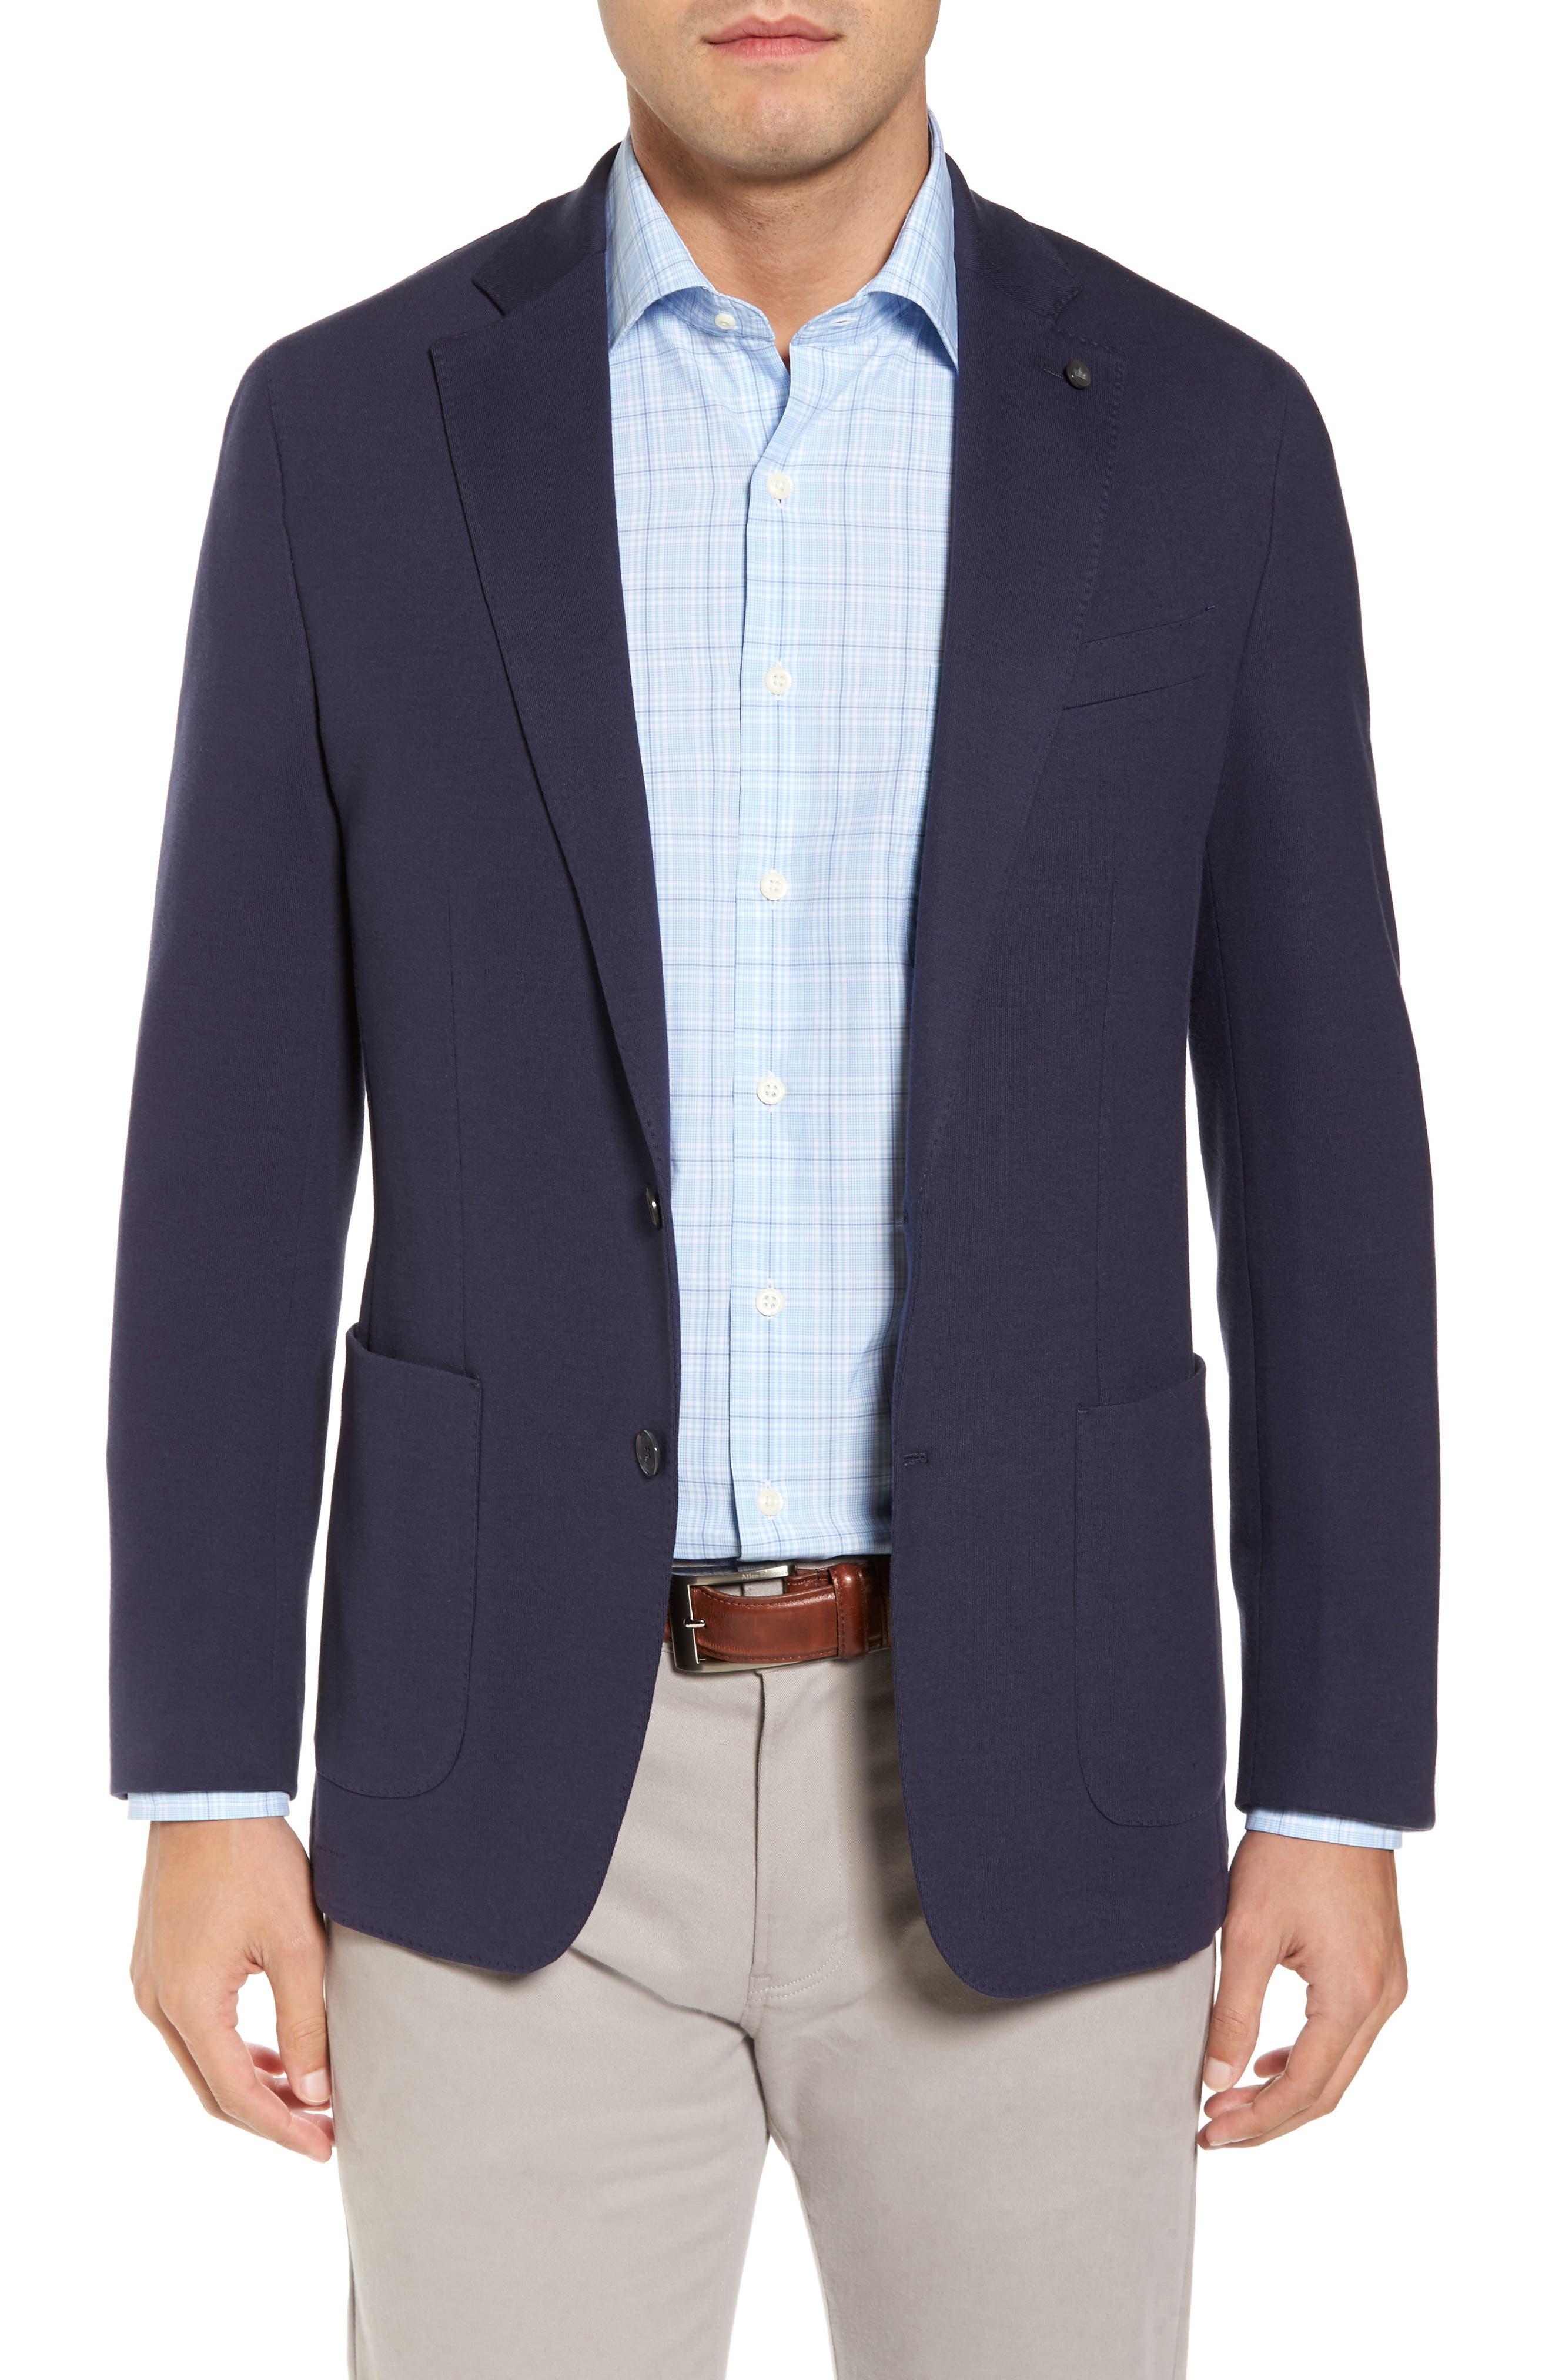 Santorini Jersey Knit Jacket,                         Main,                         color, 417